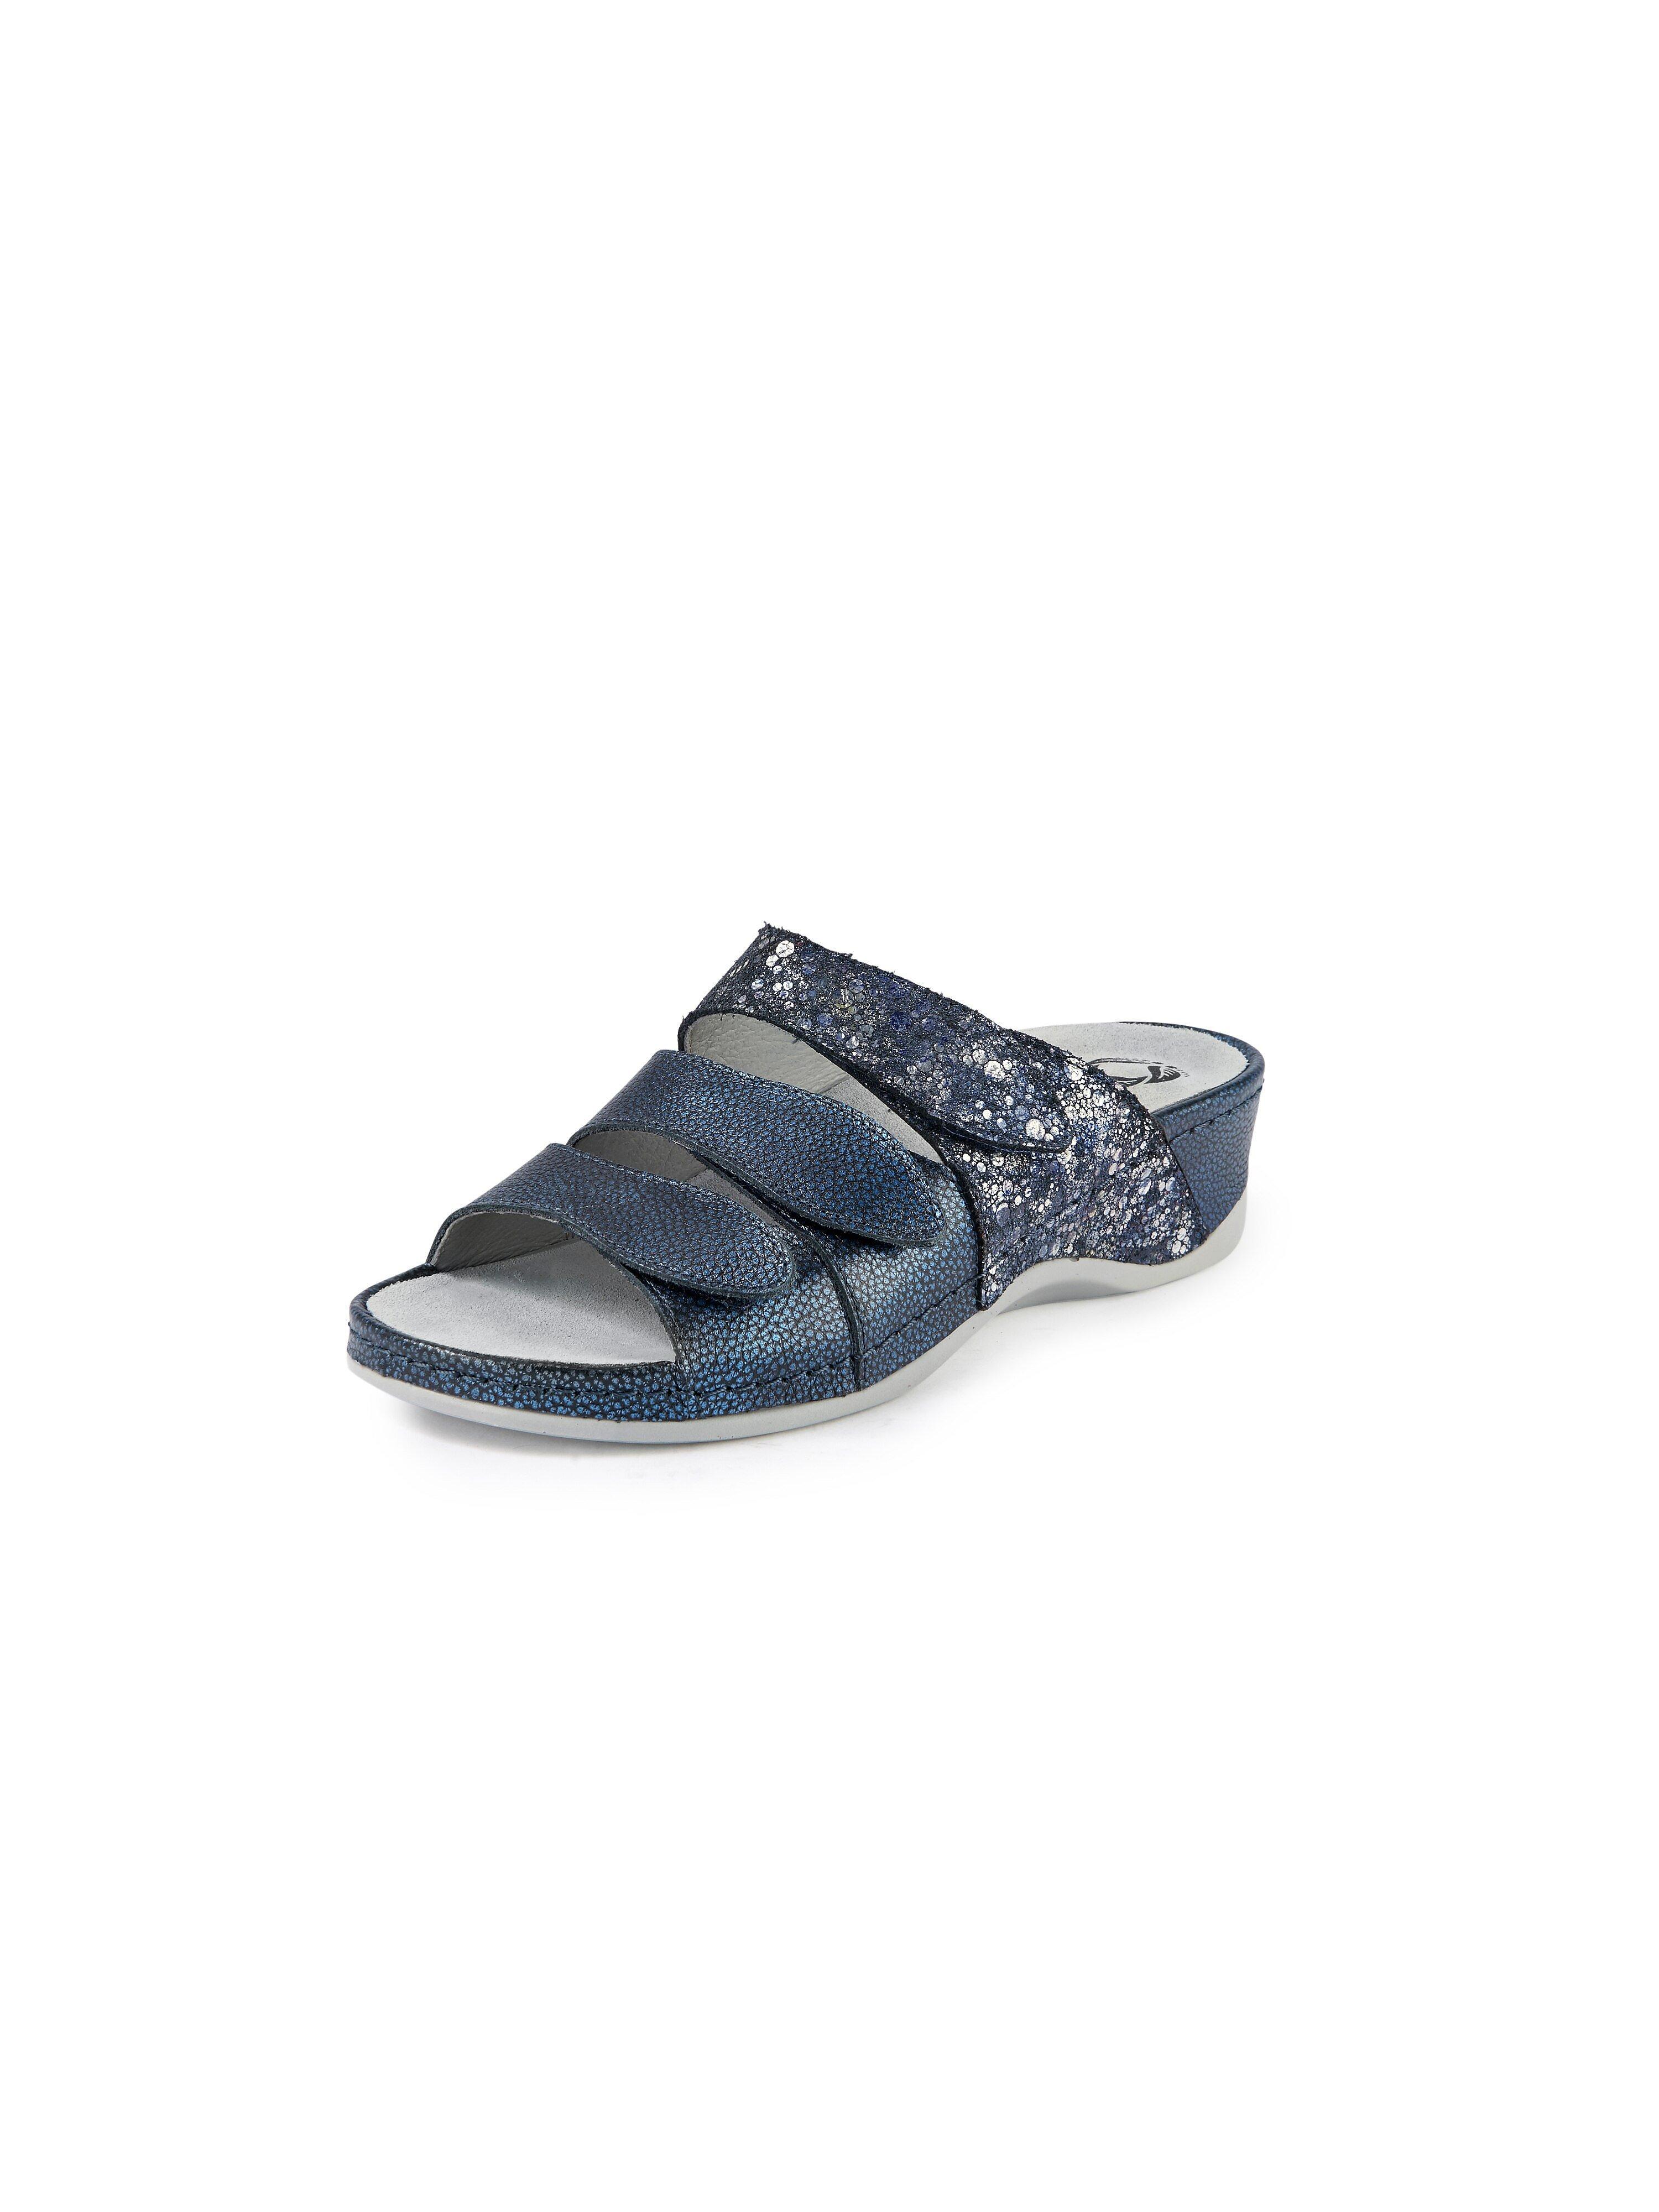 Pantoffels Van MUBB blauw